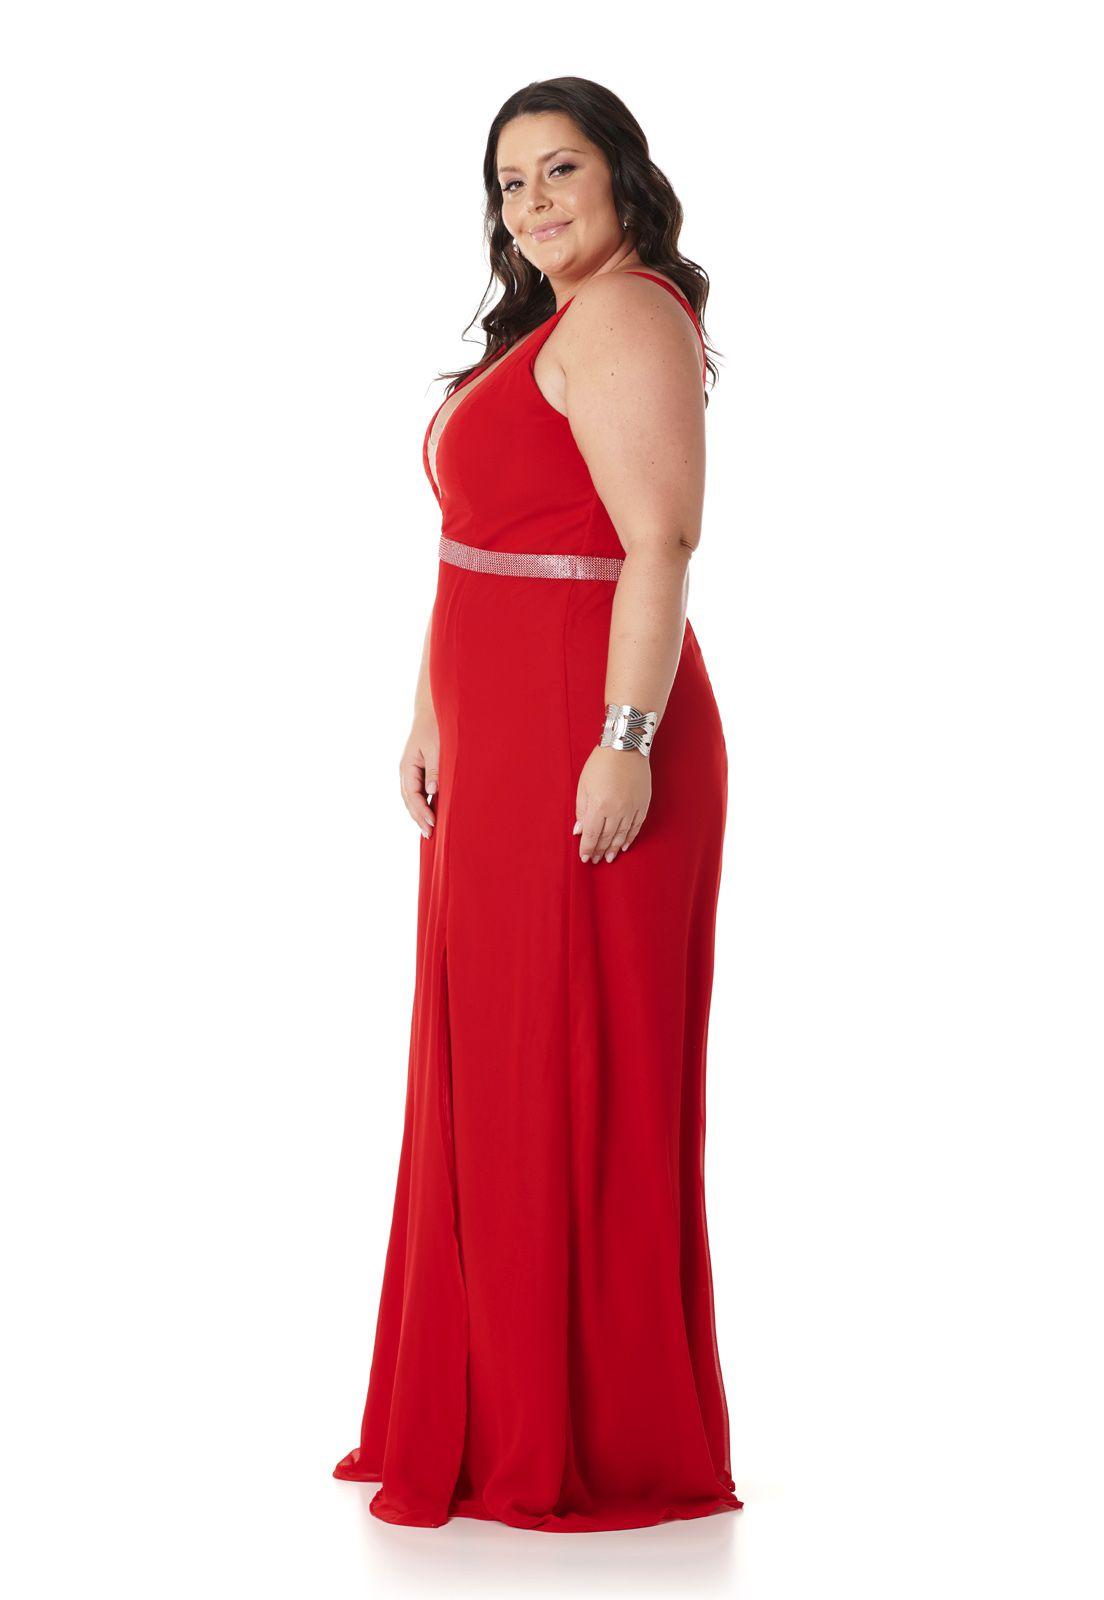 Vestido Longo Plus Size Vermelho Lala Dubi